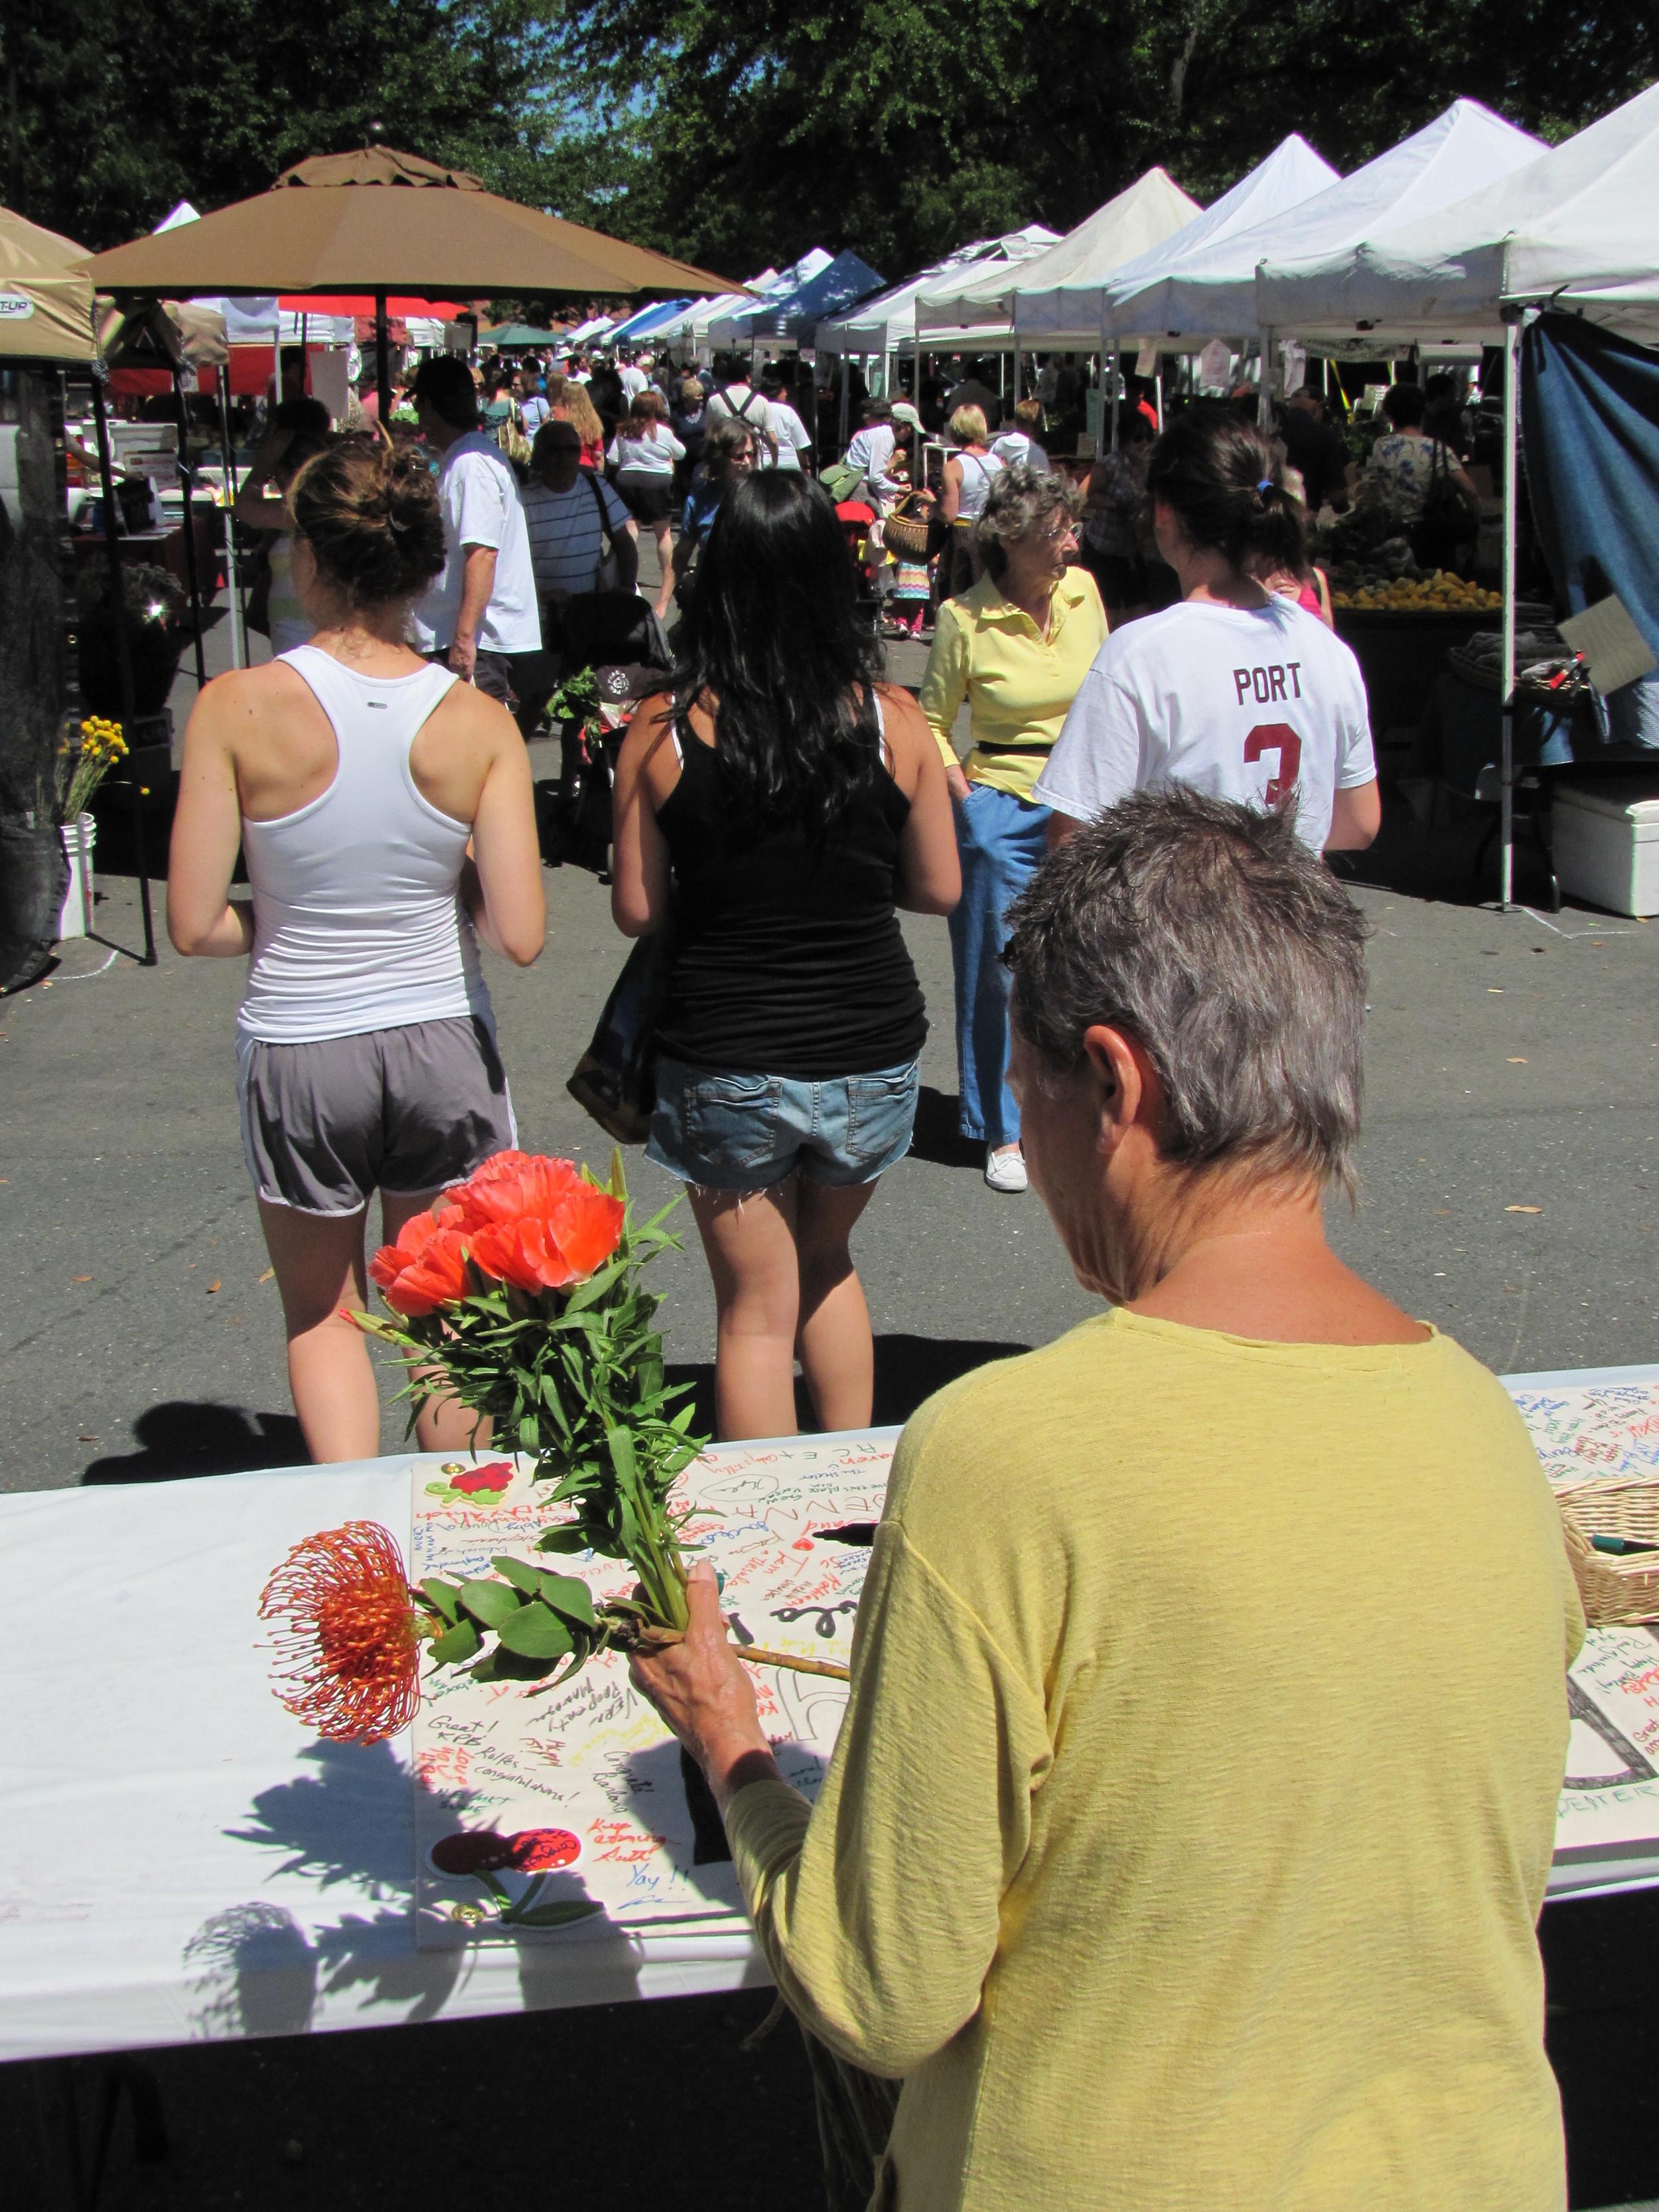 Diablo Valley Farmers' Market birthday: 5 years of Saturday farmers markets in Walnut Creek.